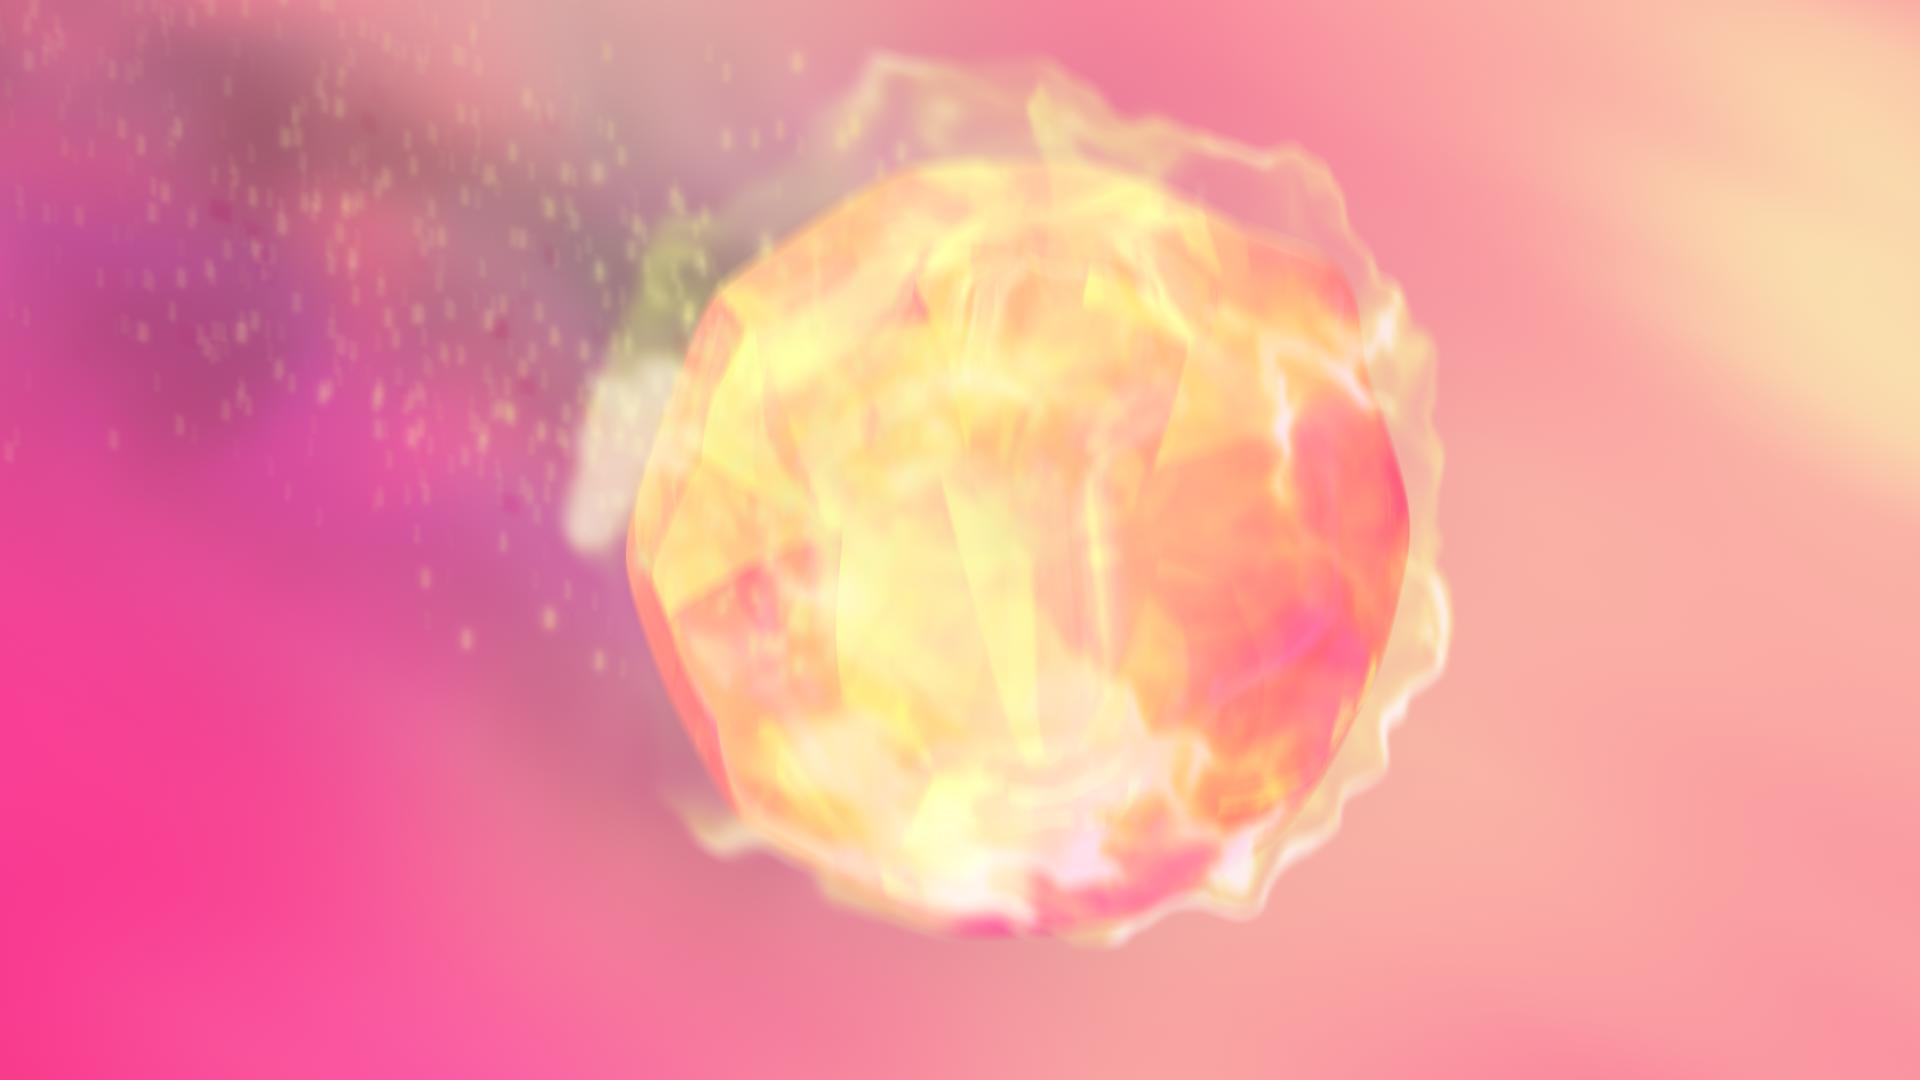 Enter-Pentavoid-Projectile